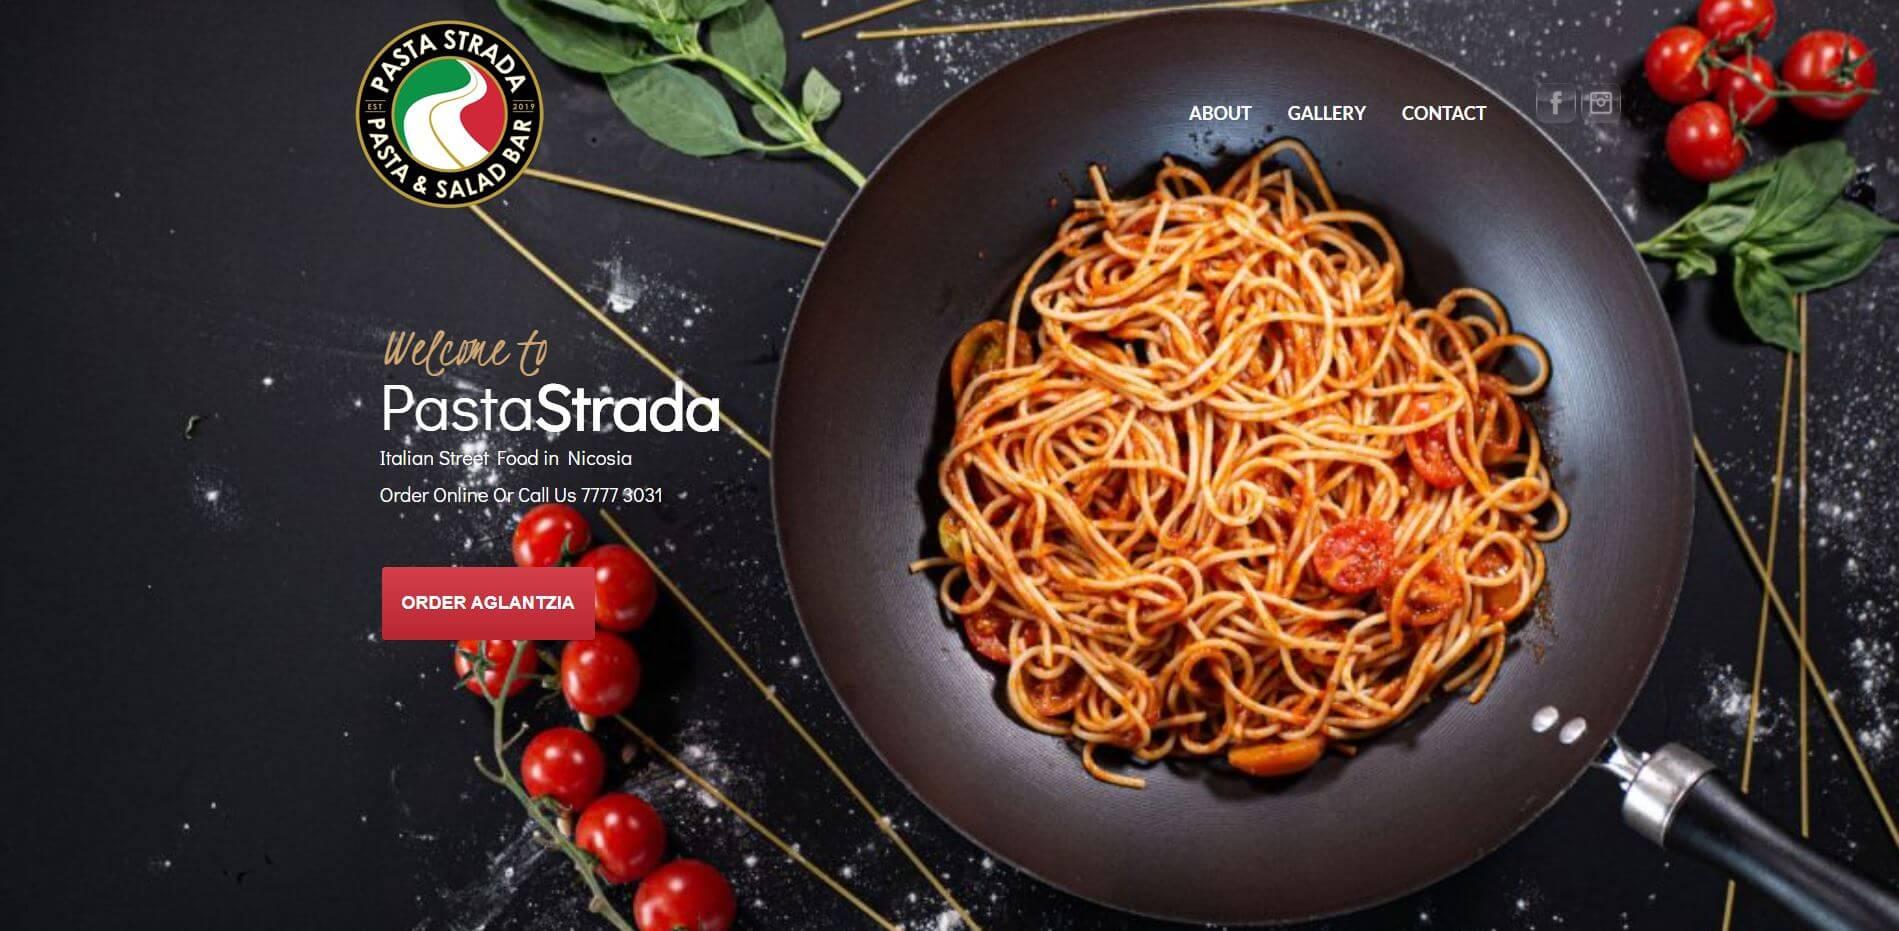 Pasta Strada Website